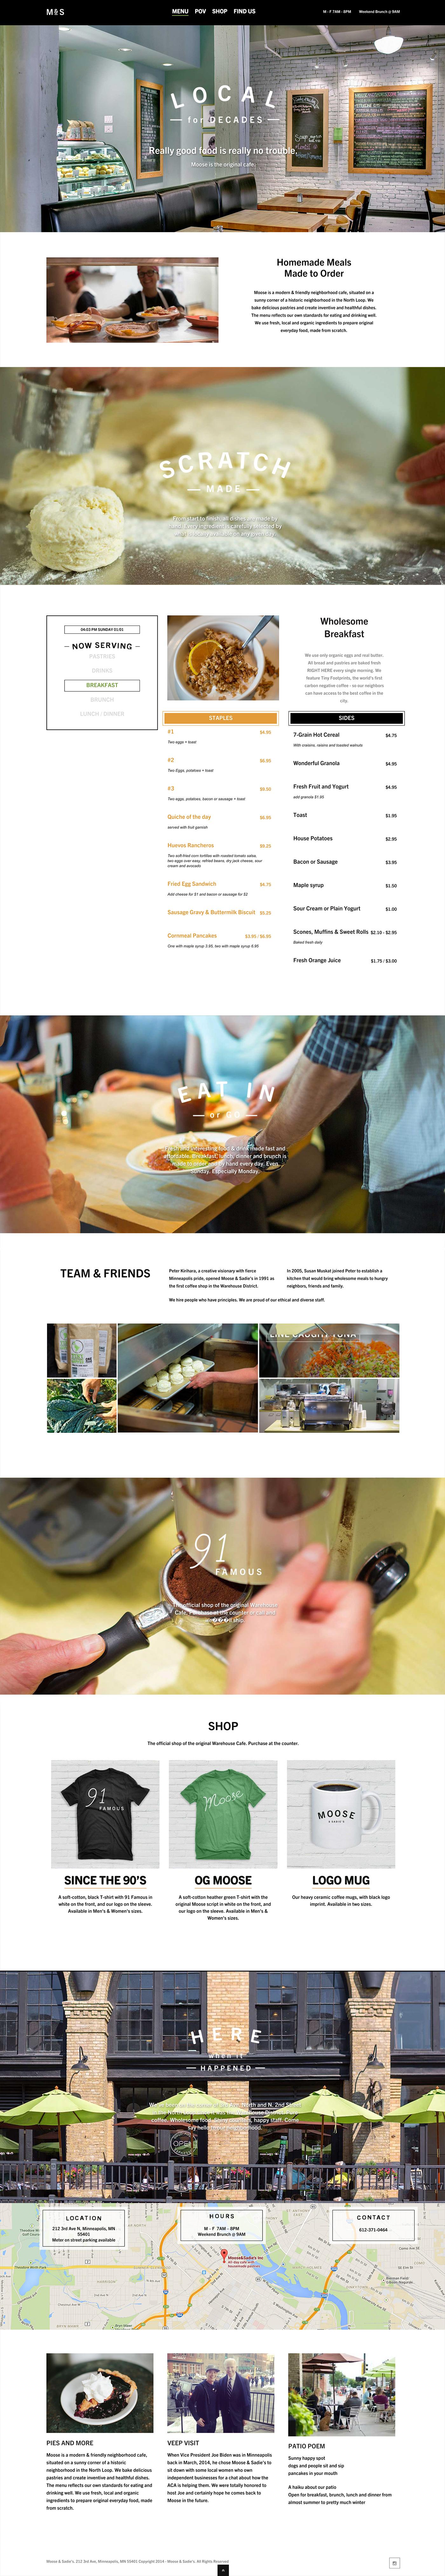 Full home page screenshot